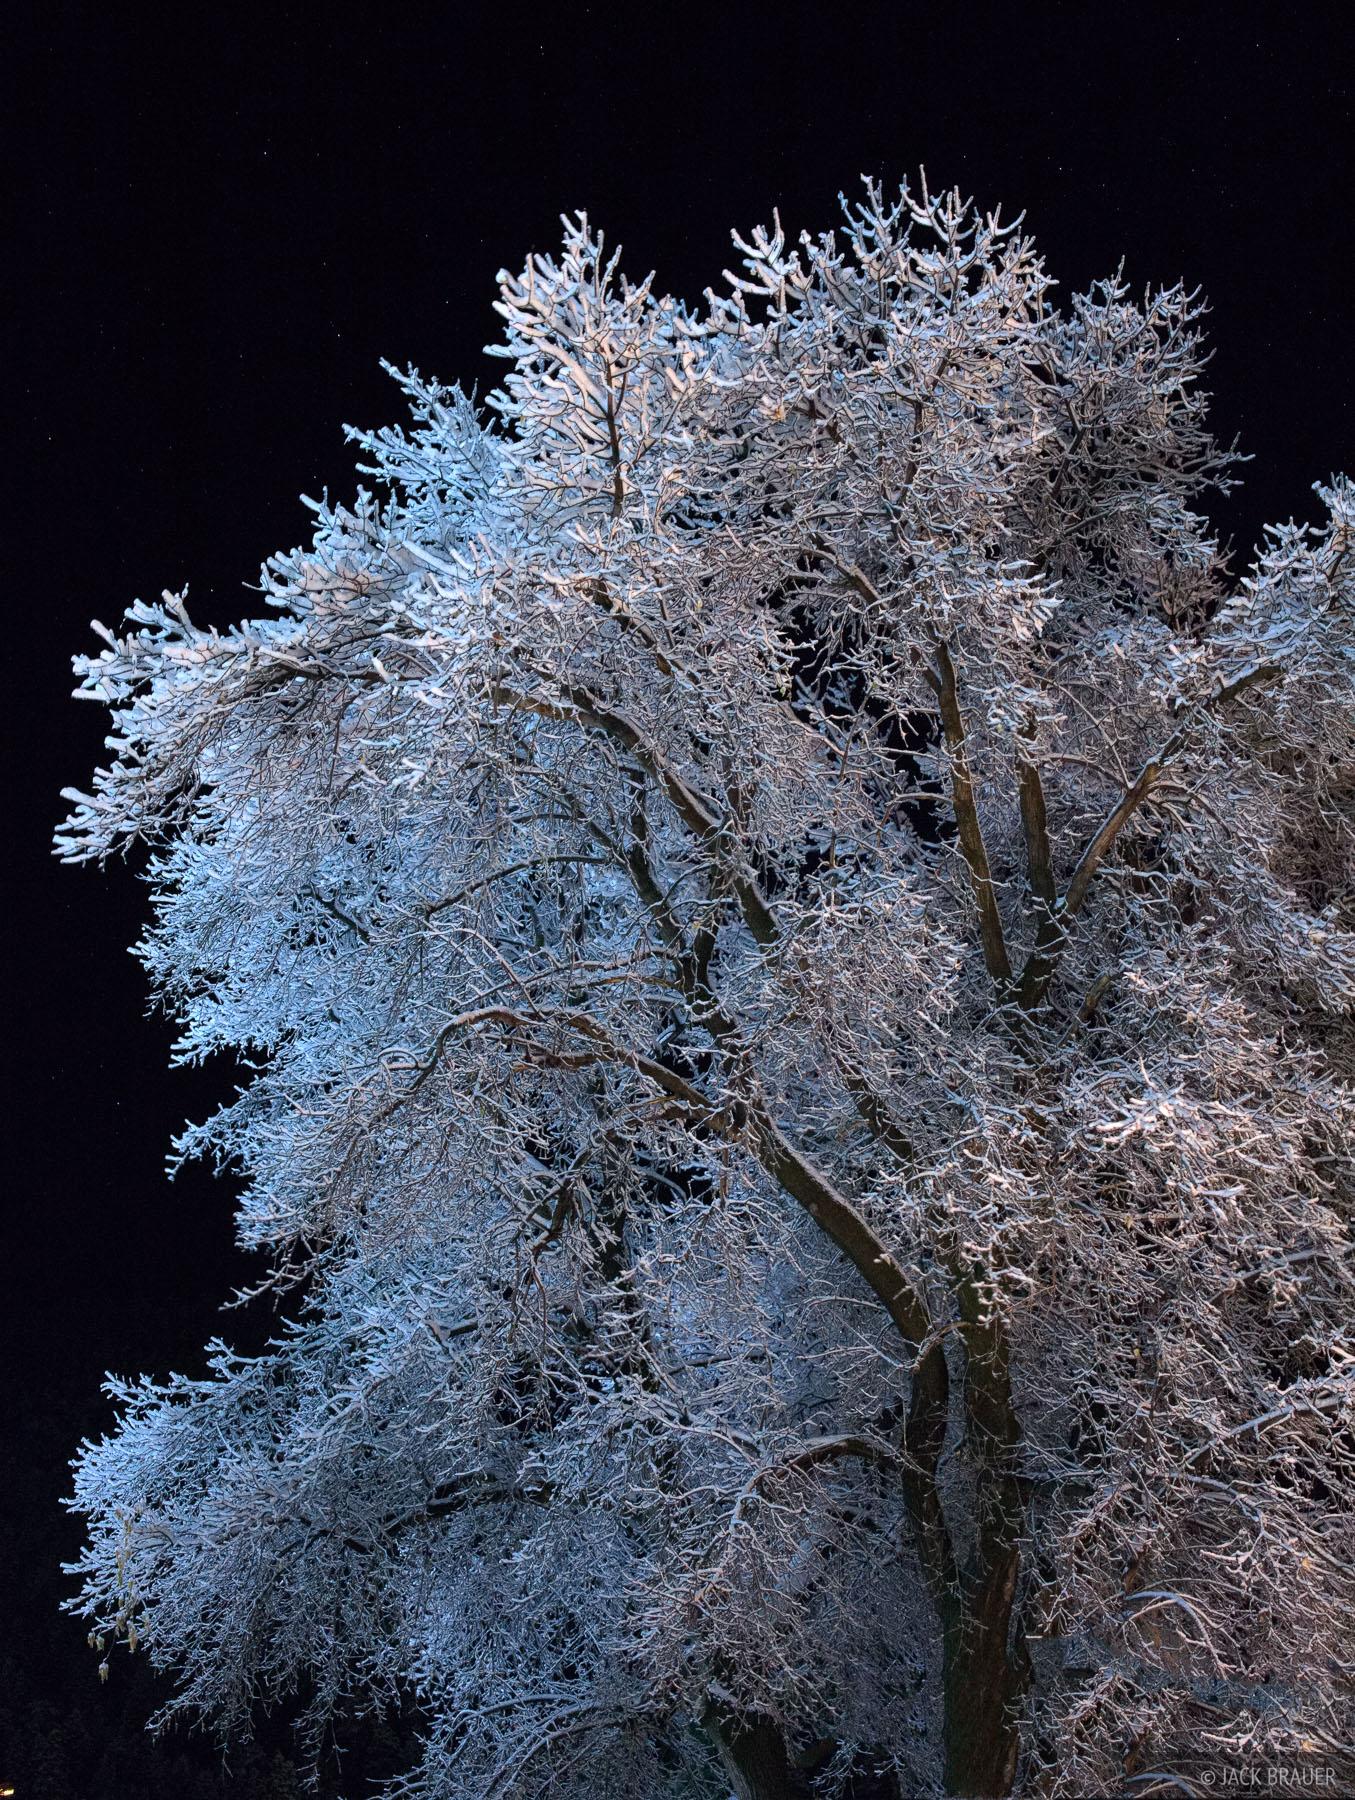 Colorado, frosty, tree, October, snow, photo